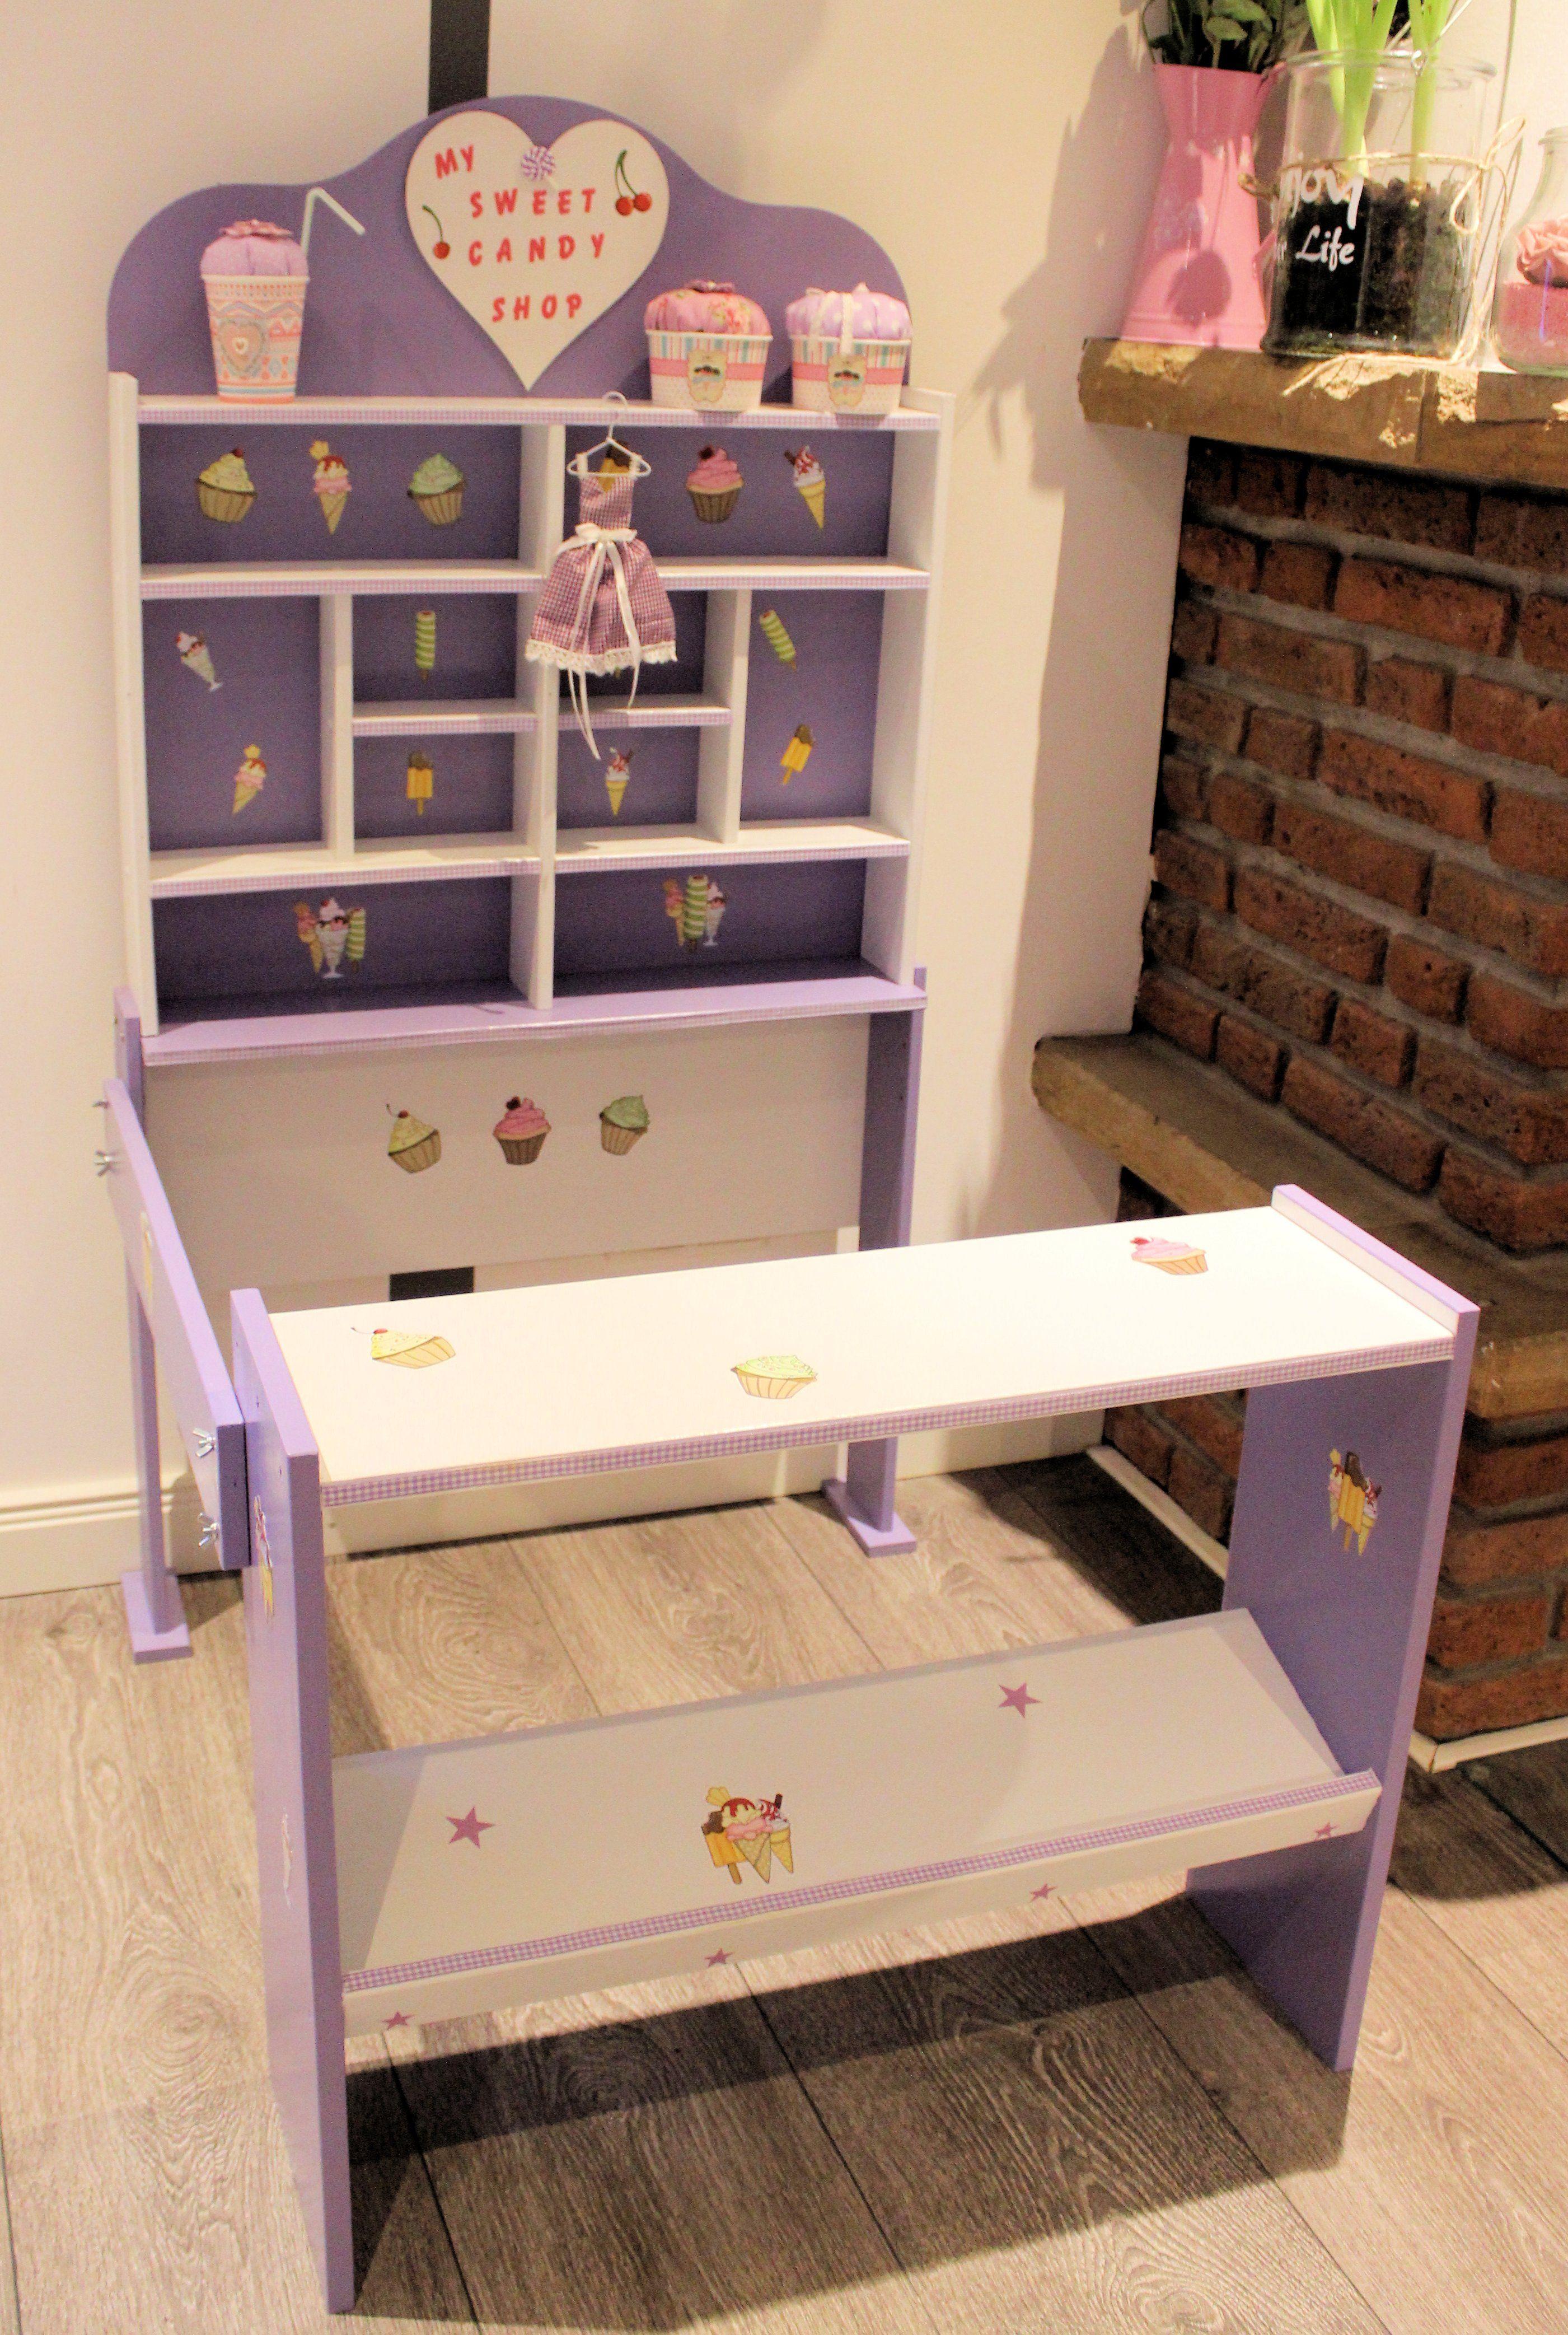 kaufladen lila weiß candy shop shabby | domis pusteblume | pinterest